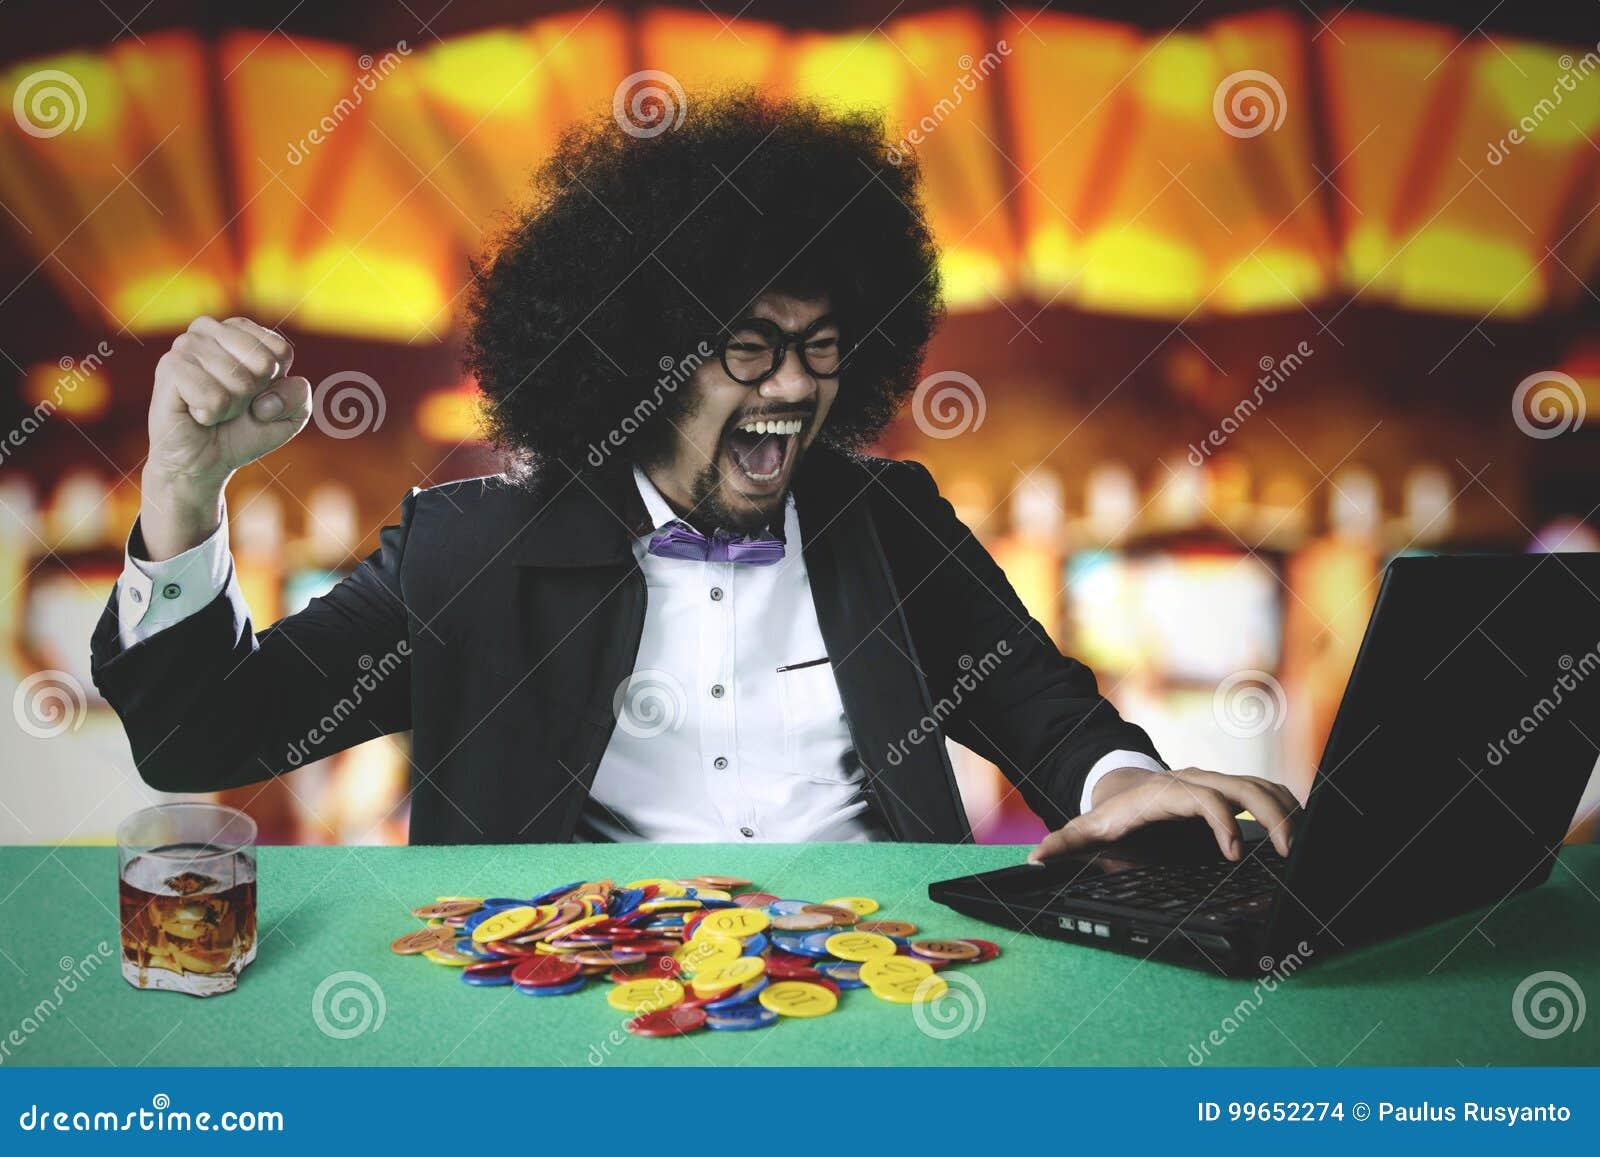 malta online casino list